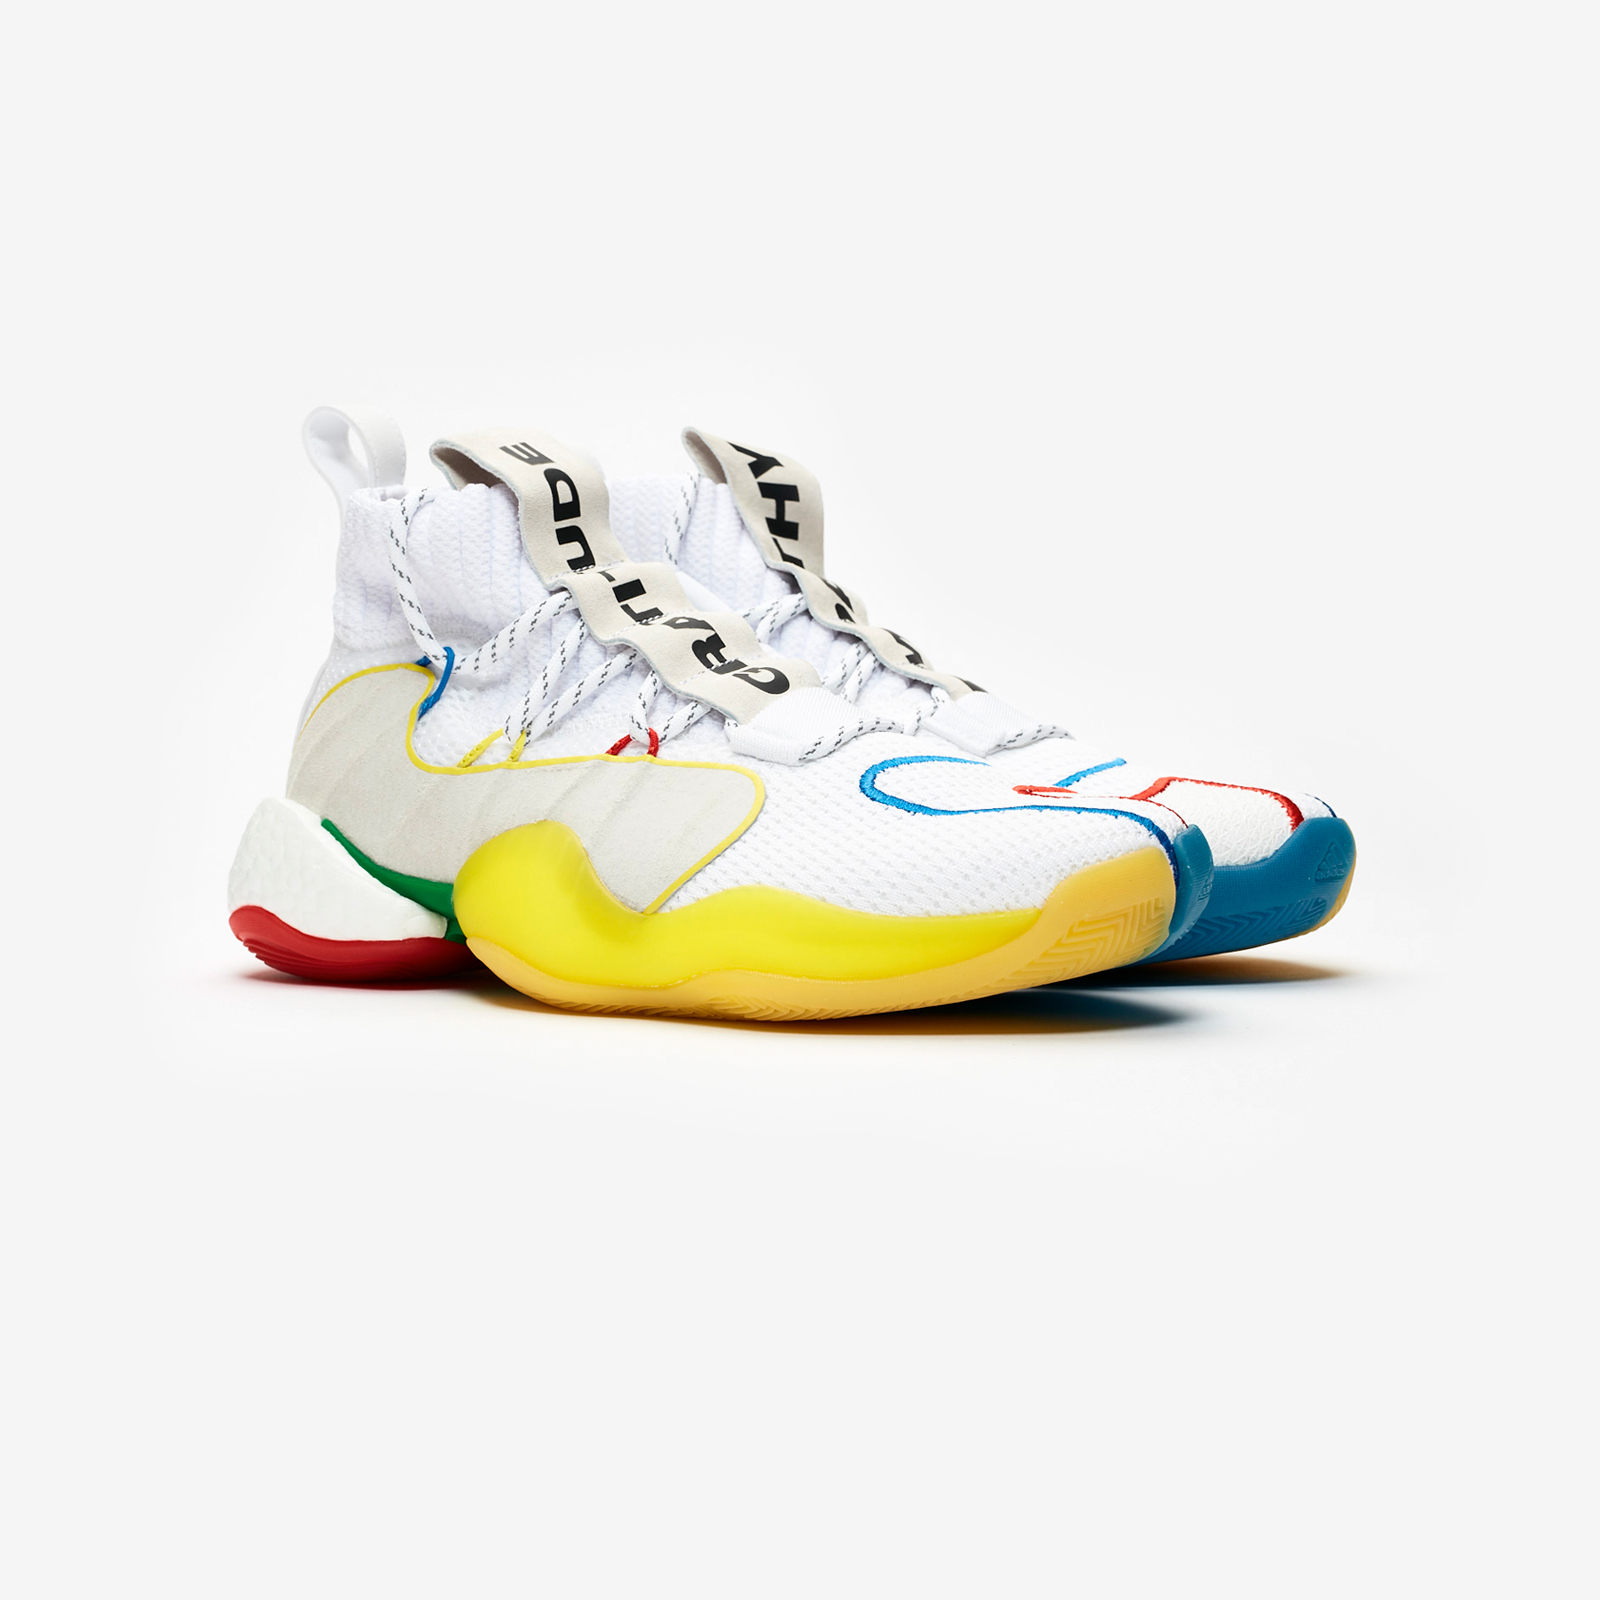 5d17ecee7db78 adidas Crazy BYW LVL X PW - Ef3500 - Sneakersnstuff